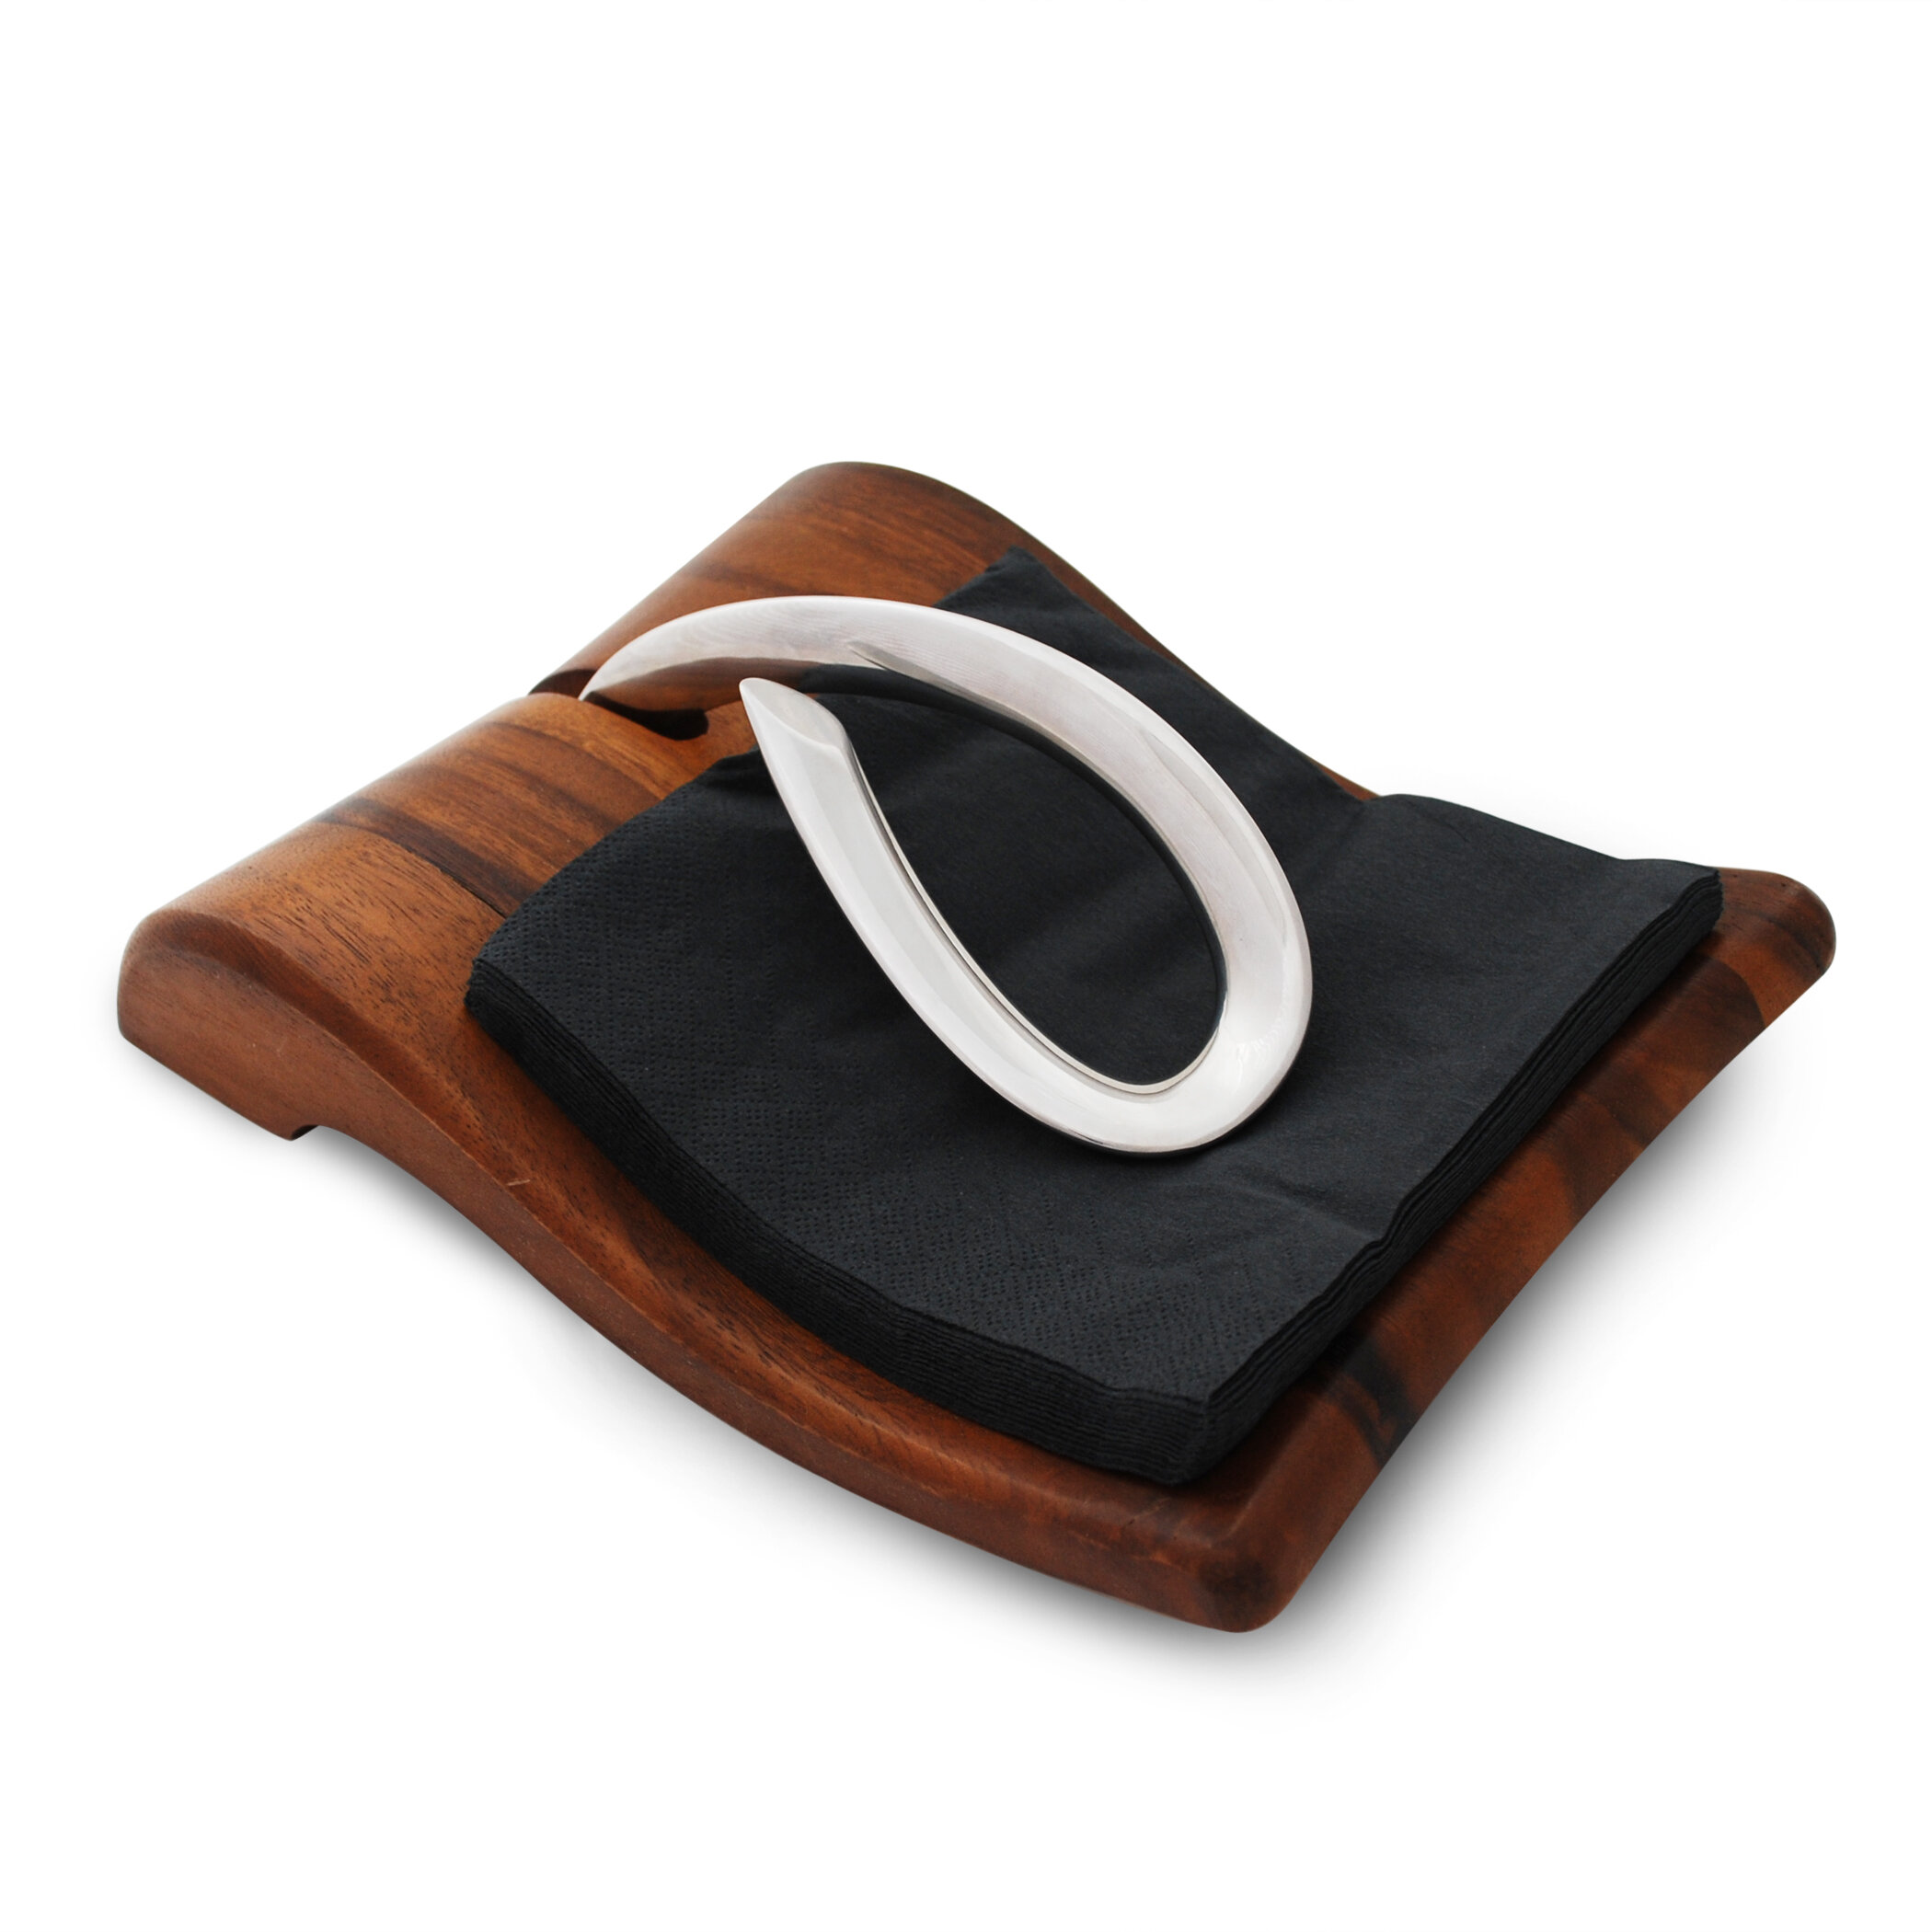 Napkin Rings Holders Acacia Wood Napkin Holder Modern Kitchen Decor Napkins Storage Table Top Stand Home Furniture Diy Tallergrafico Com Uy